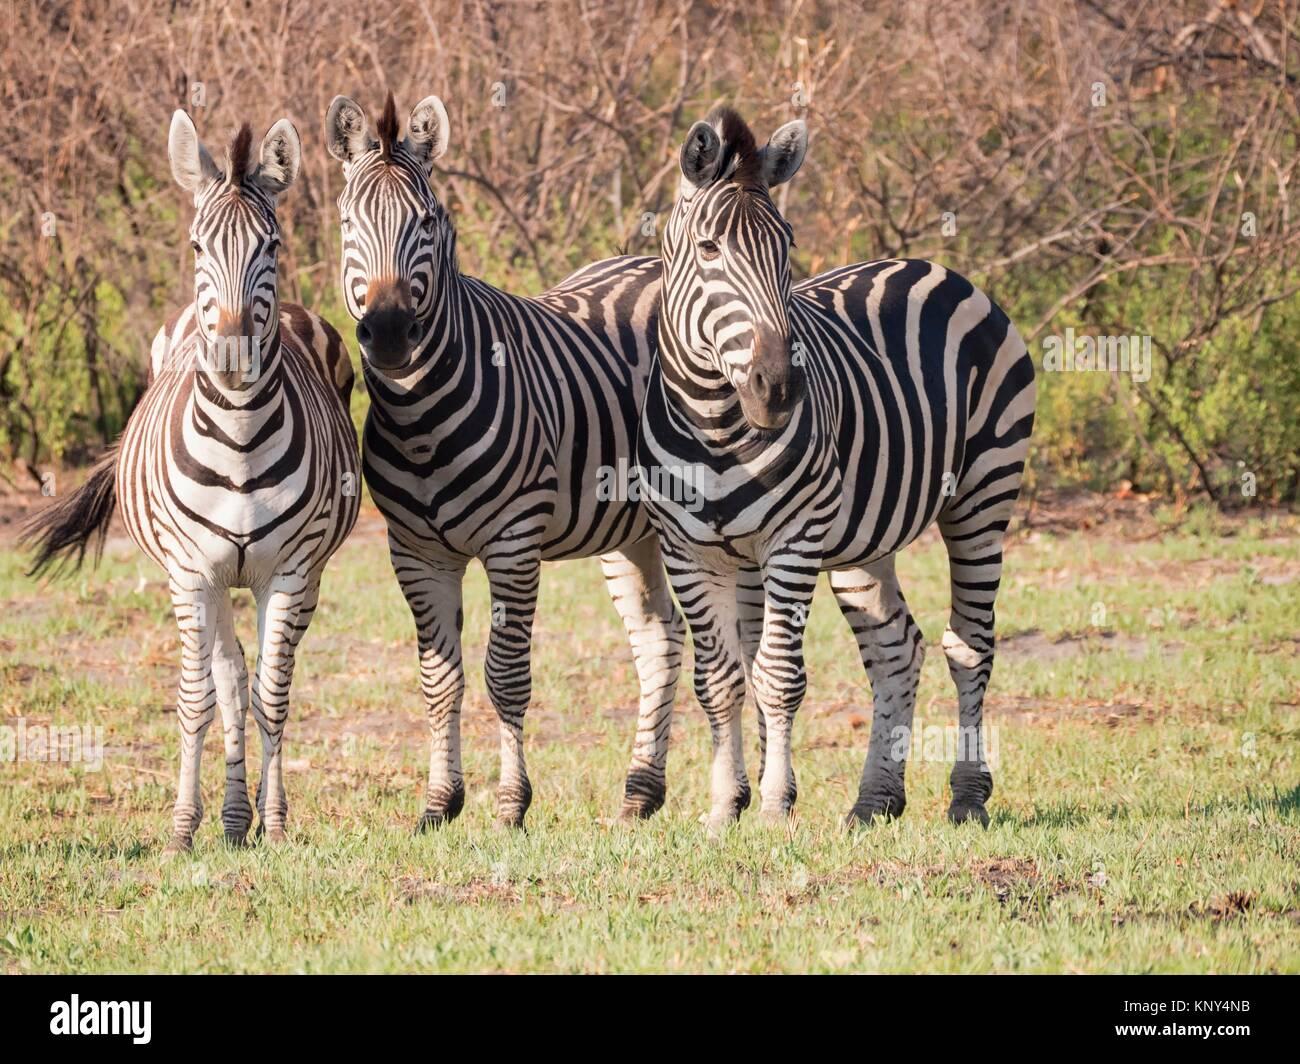 Botswana. Zebra. - Stock Image